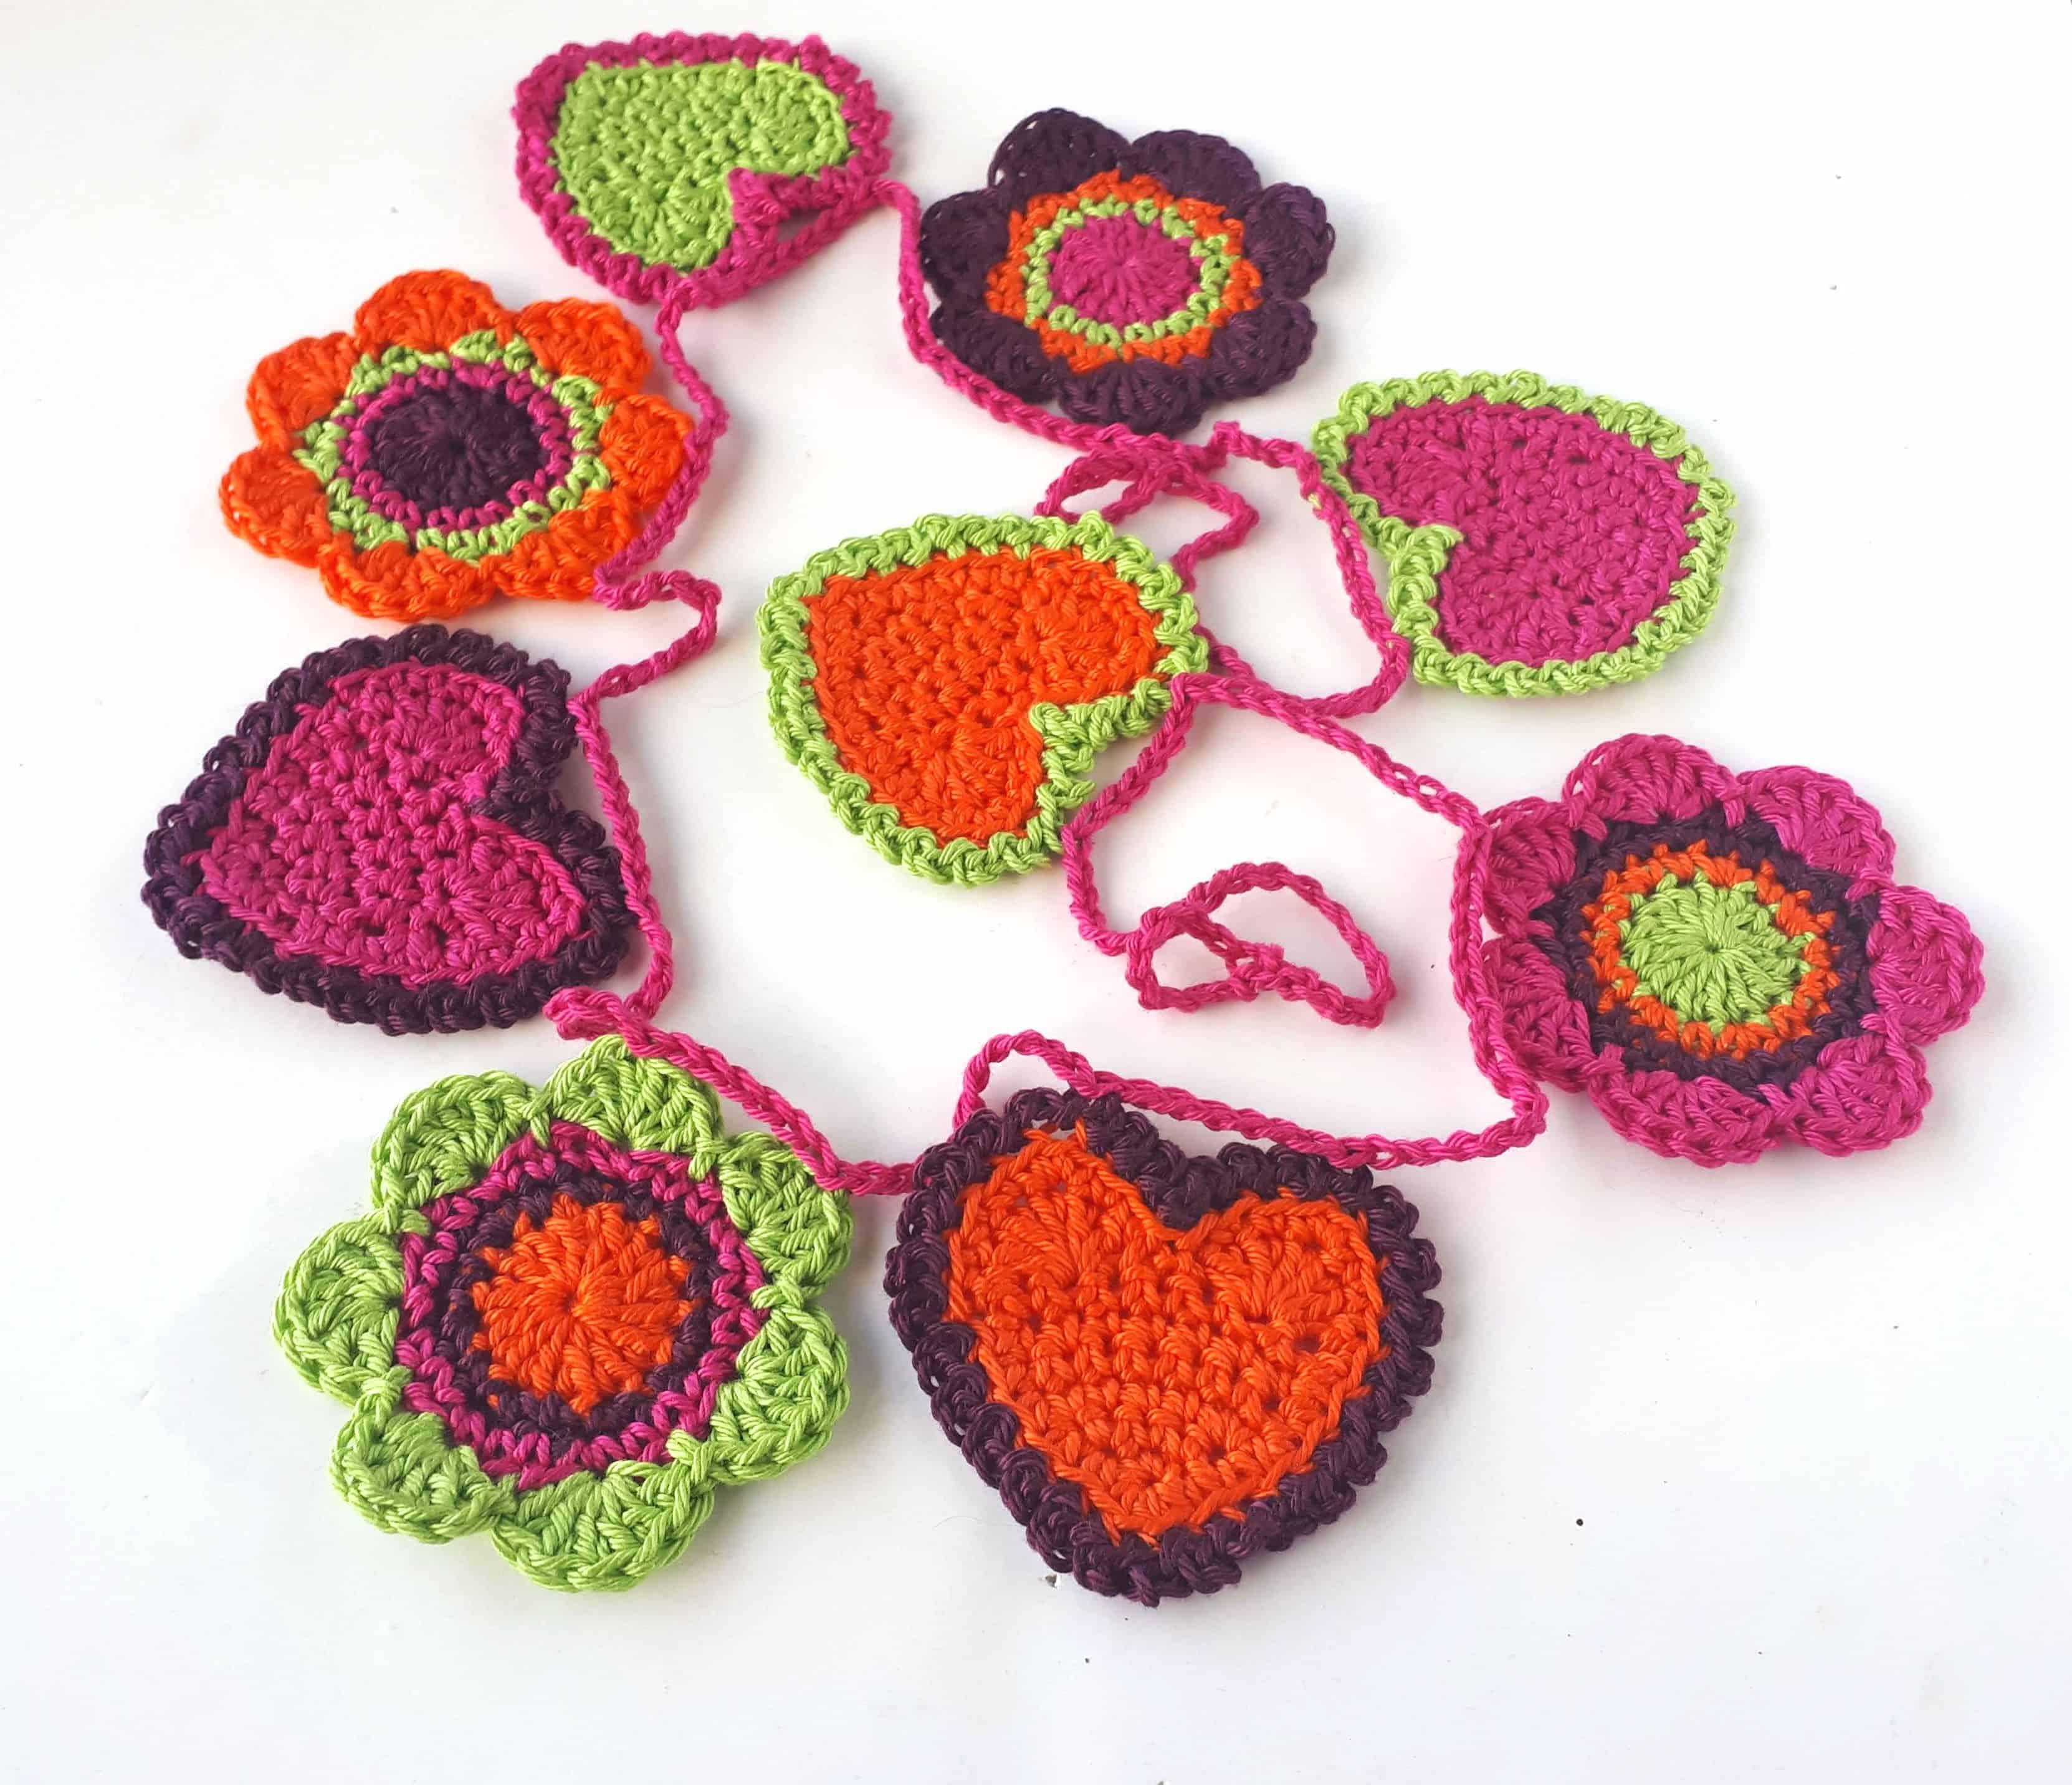 Crochet Garland For Valentines Day Free Crochet Pattern